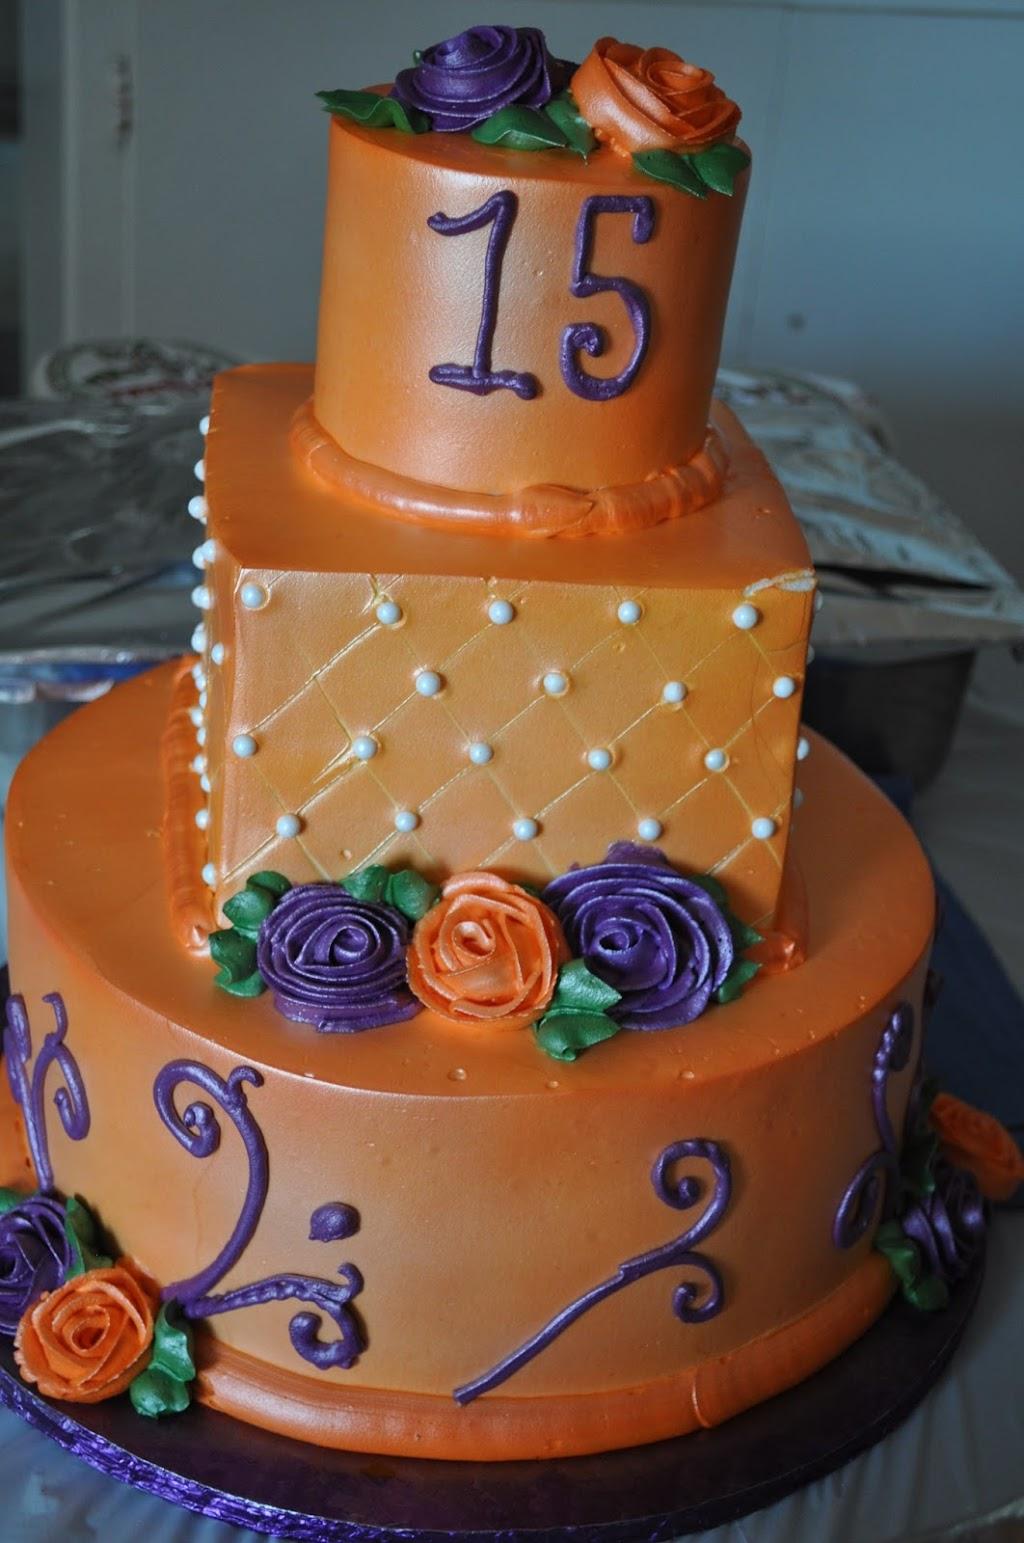 Las Tres Princesas Bakery - bakery  | Photo 5 of 7 | Address: 2736 N Bristol St, Santa Ana, CA 92706, USA | Phone: (714) 542-2131